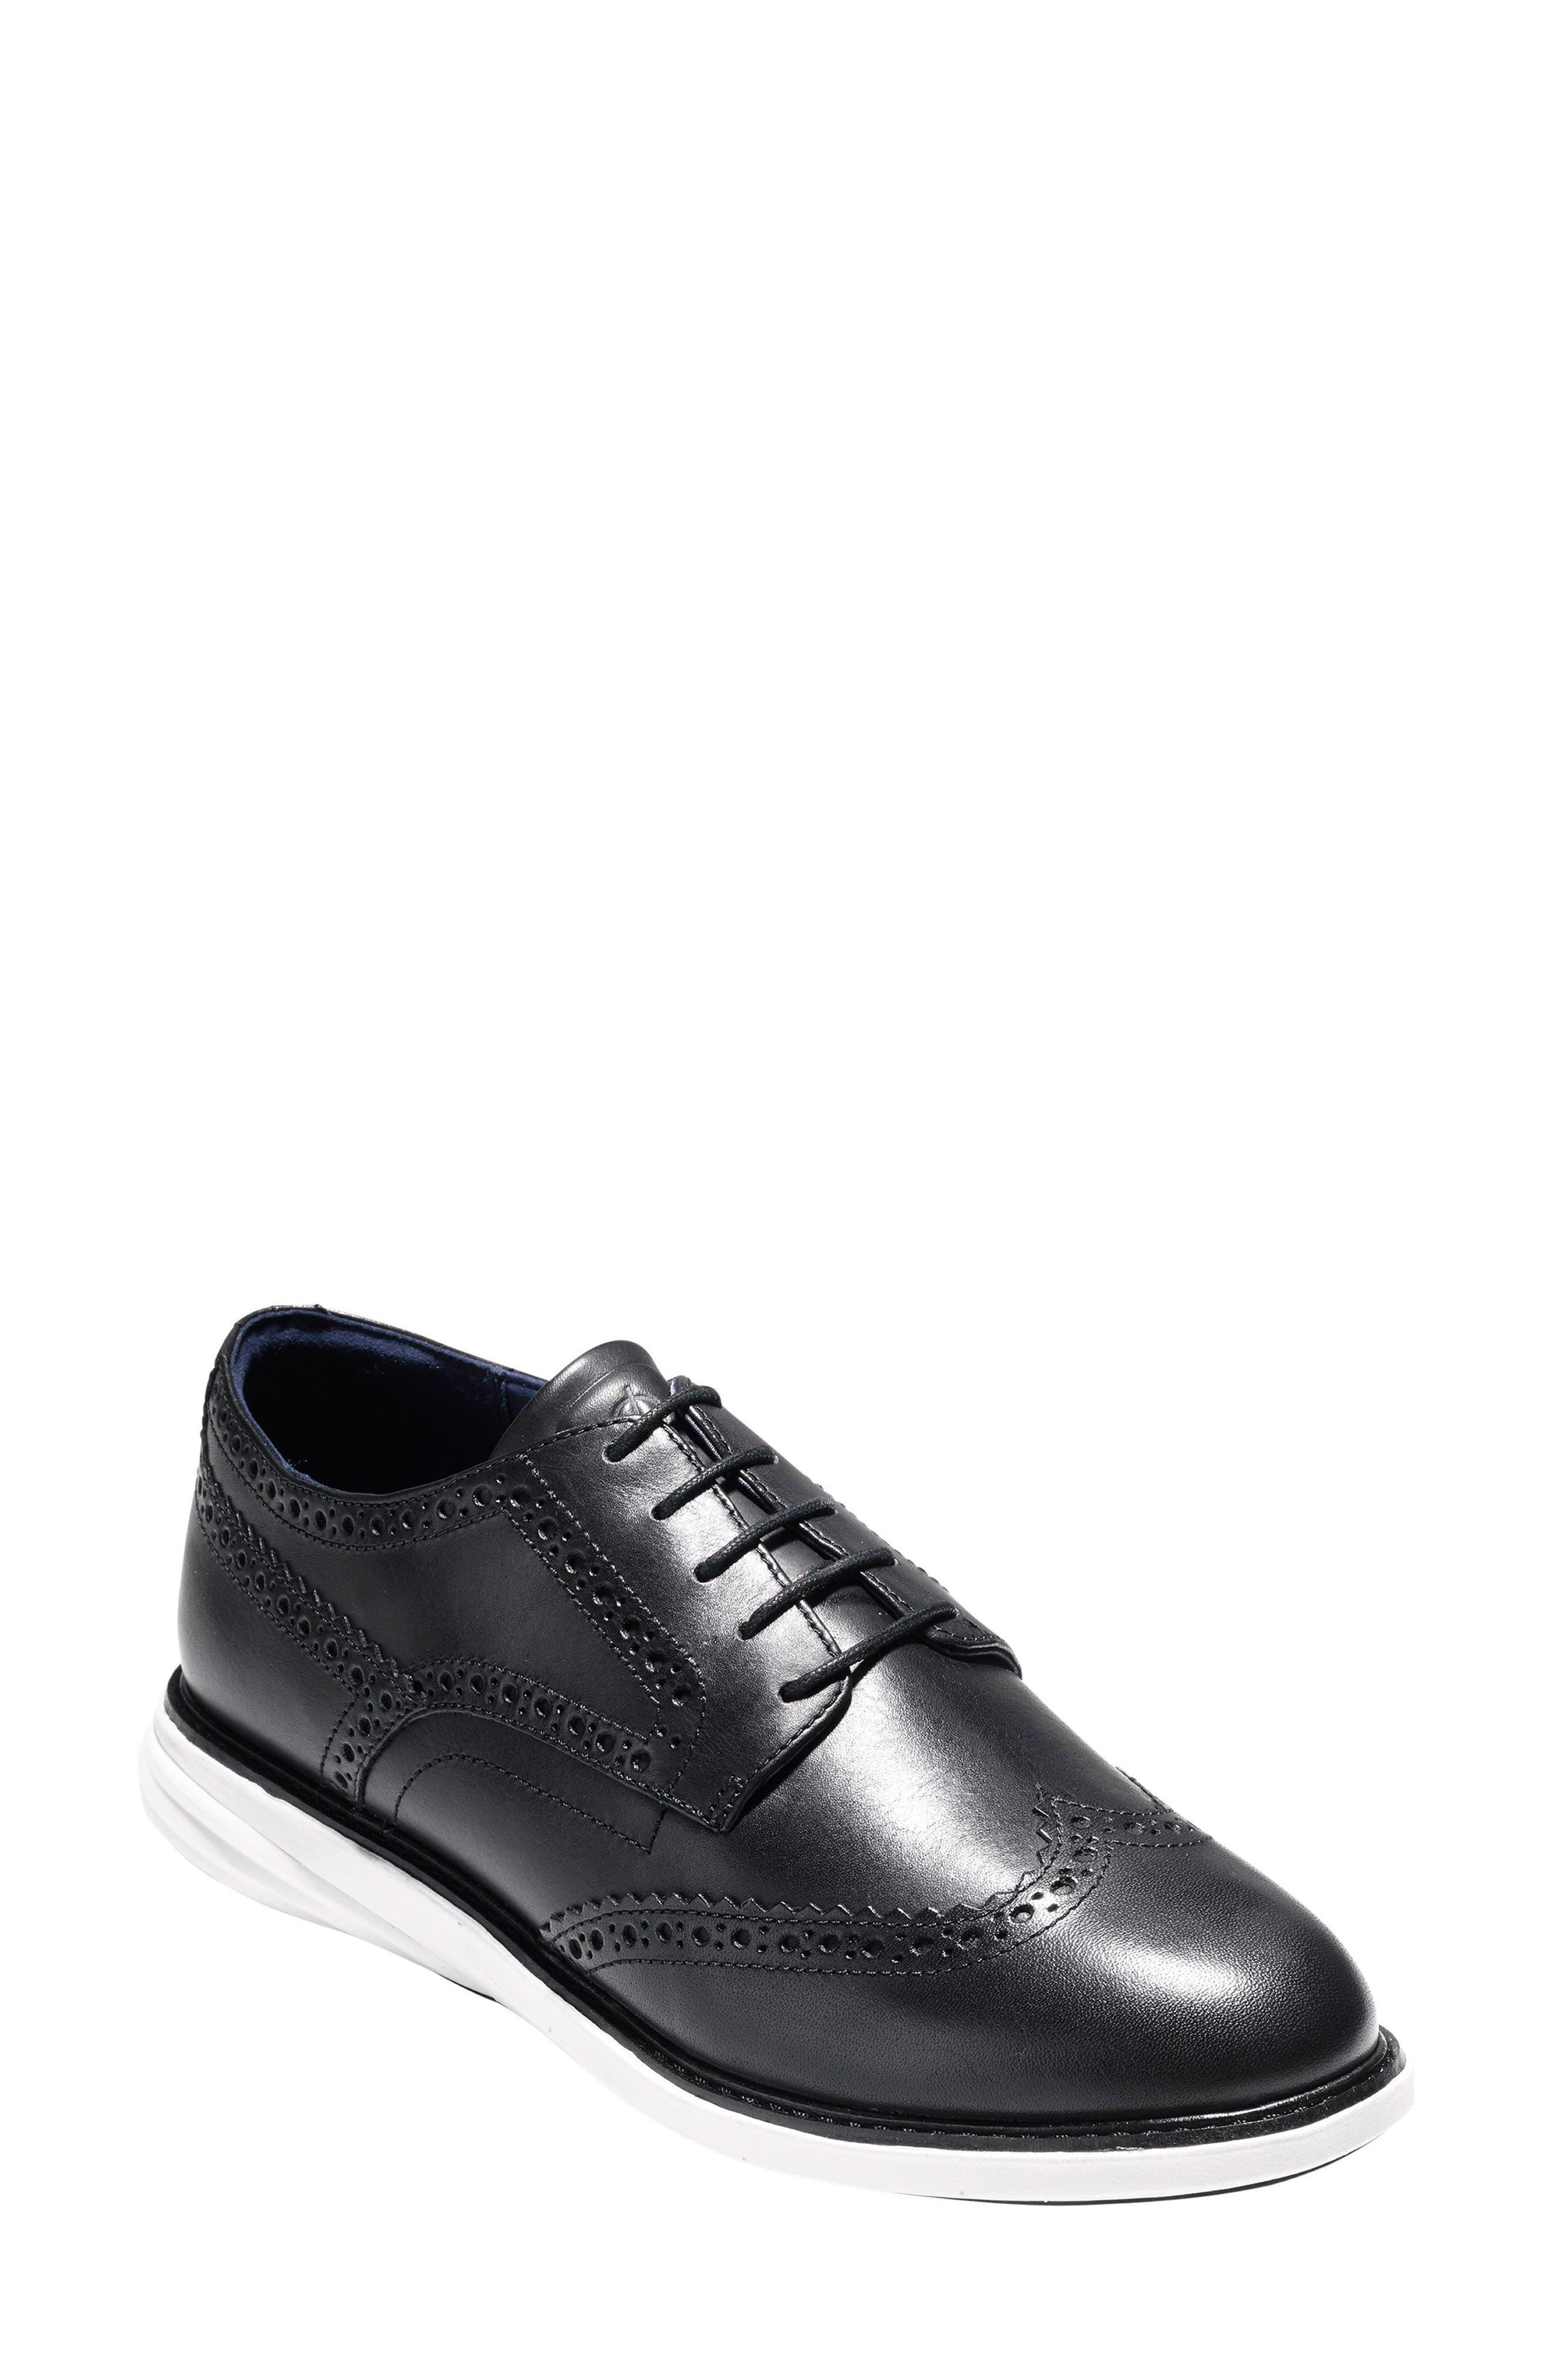 Gradevolution Oxford Sneaker,                             Main thumbnail 1, color,                             Black/ Optic White Leather